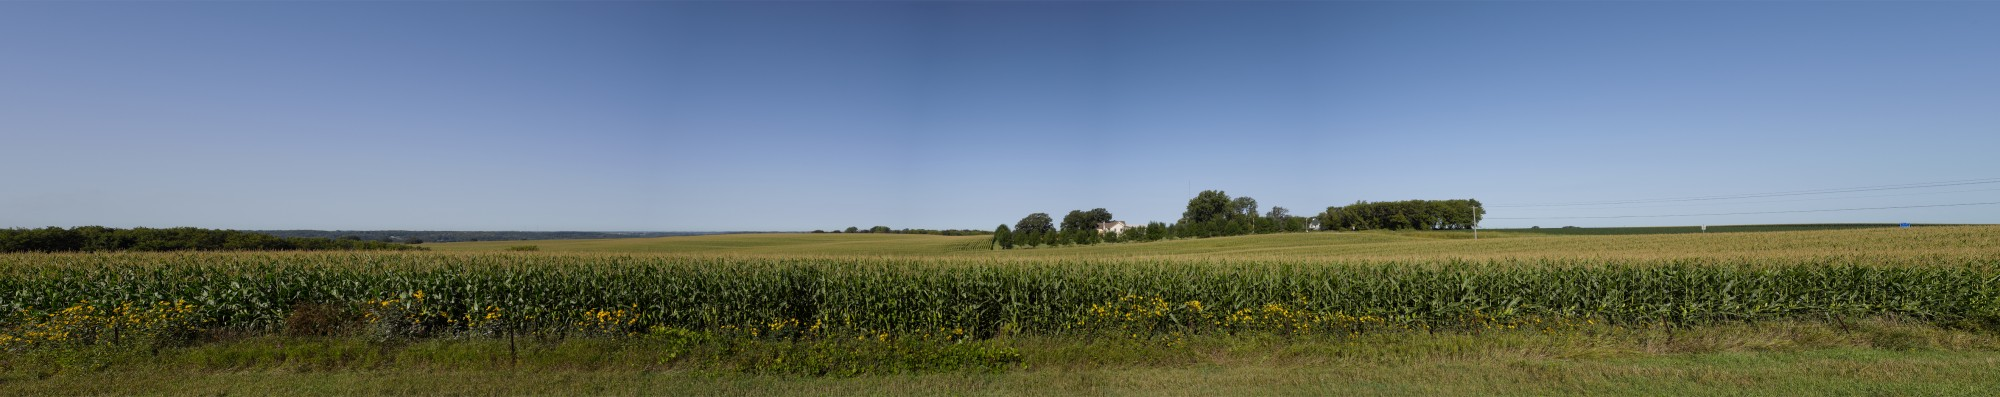 Corn field, translite, Richard Lund, Minnesota,